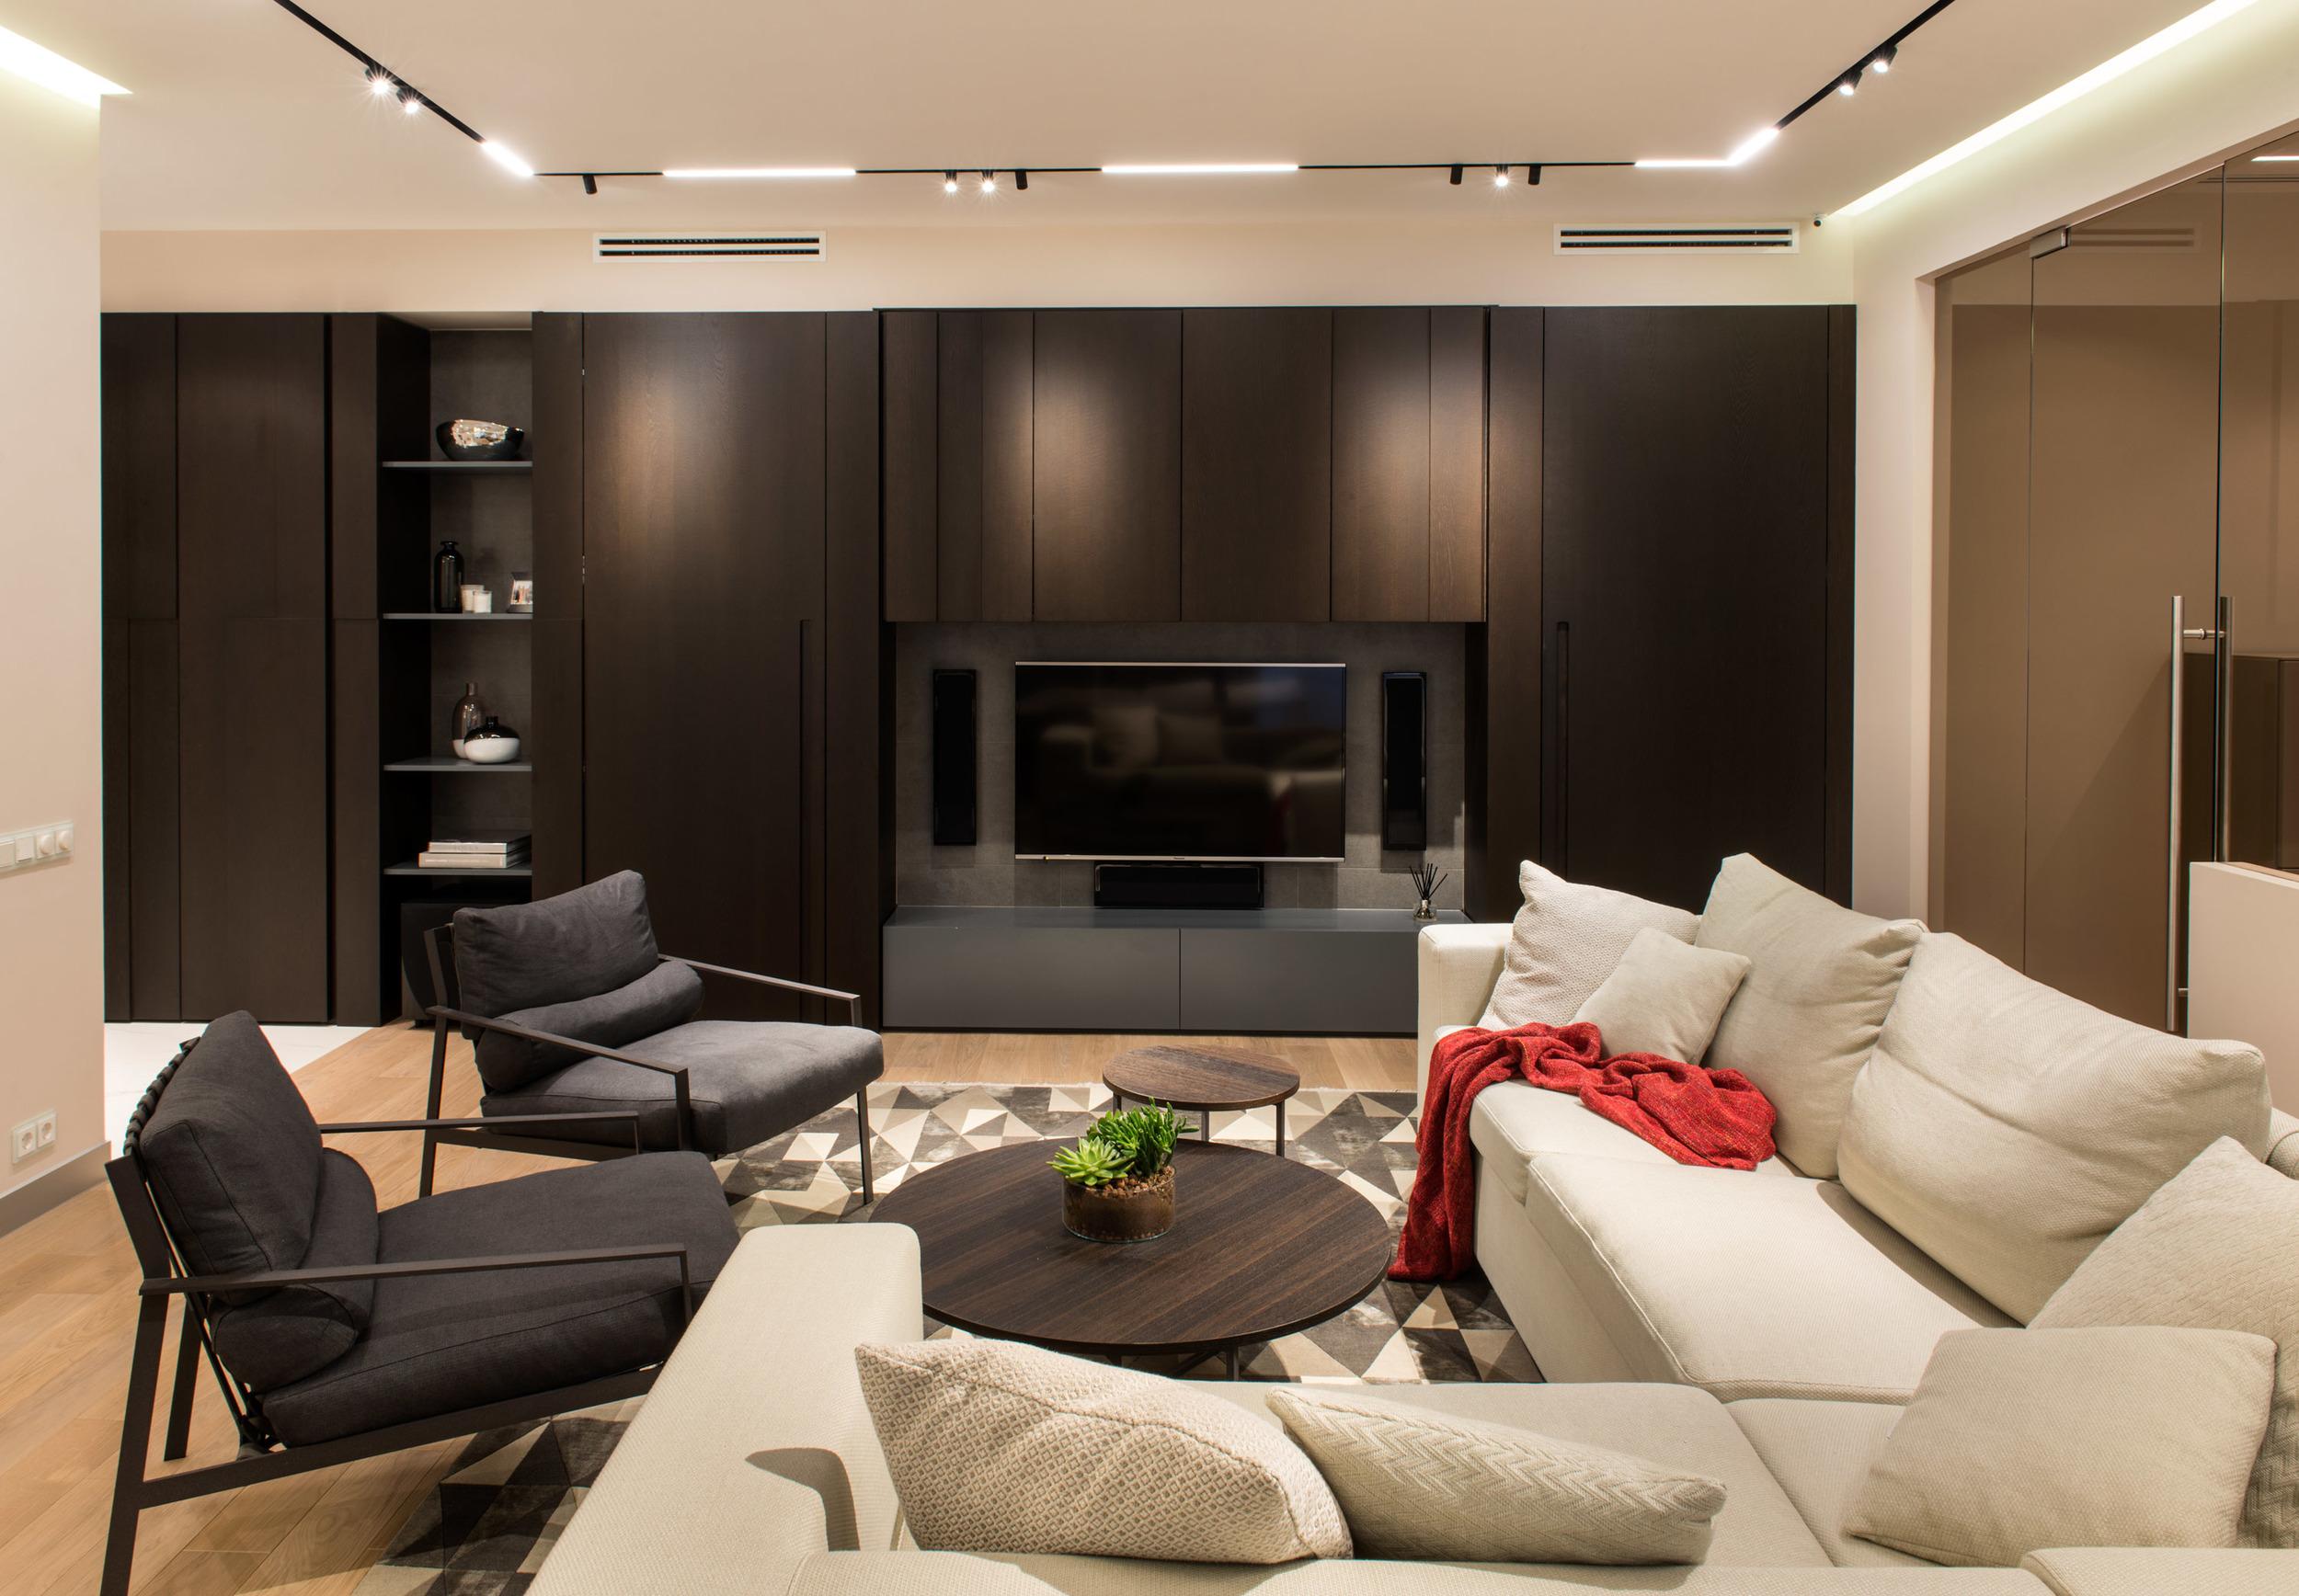 01_Match Architects_living room.jpg